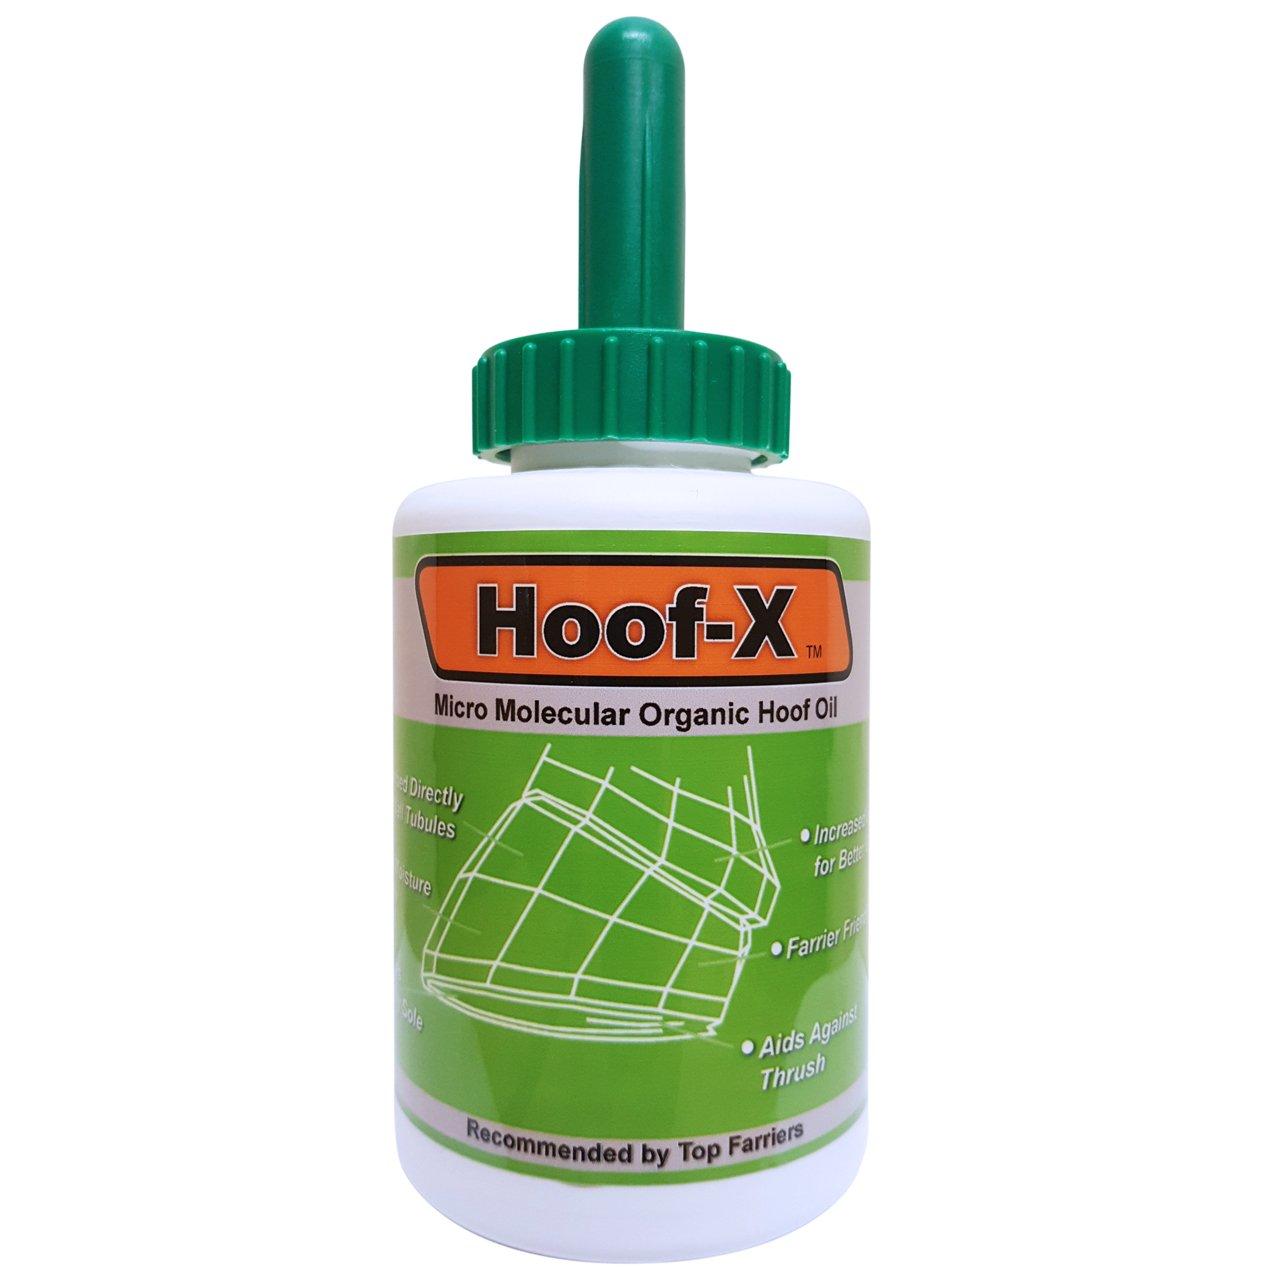 Hoof-X